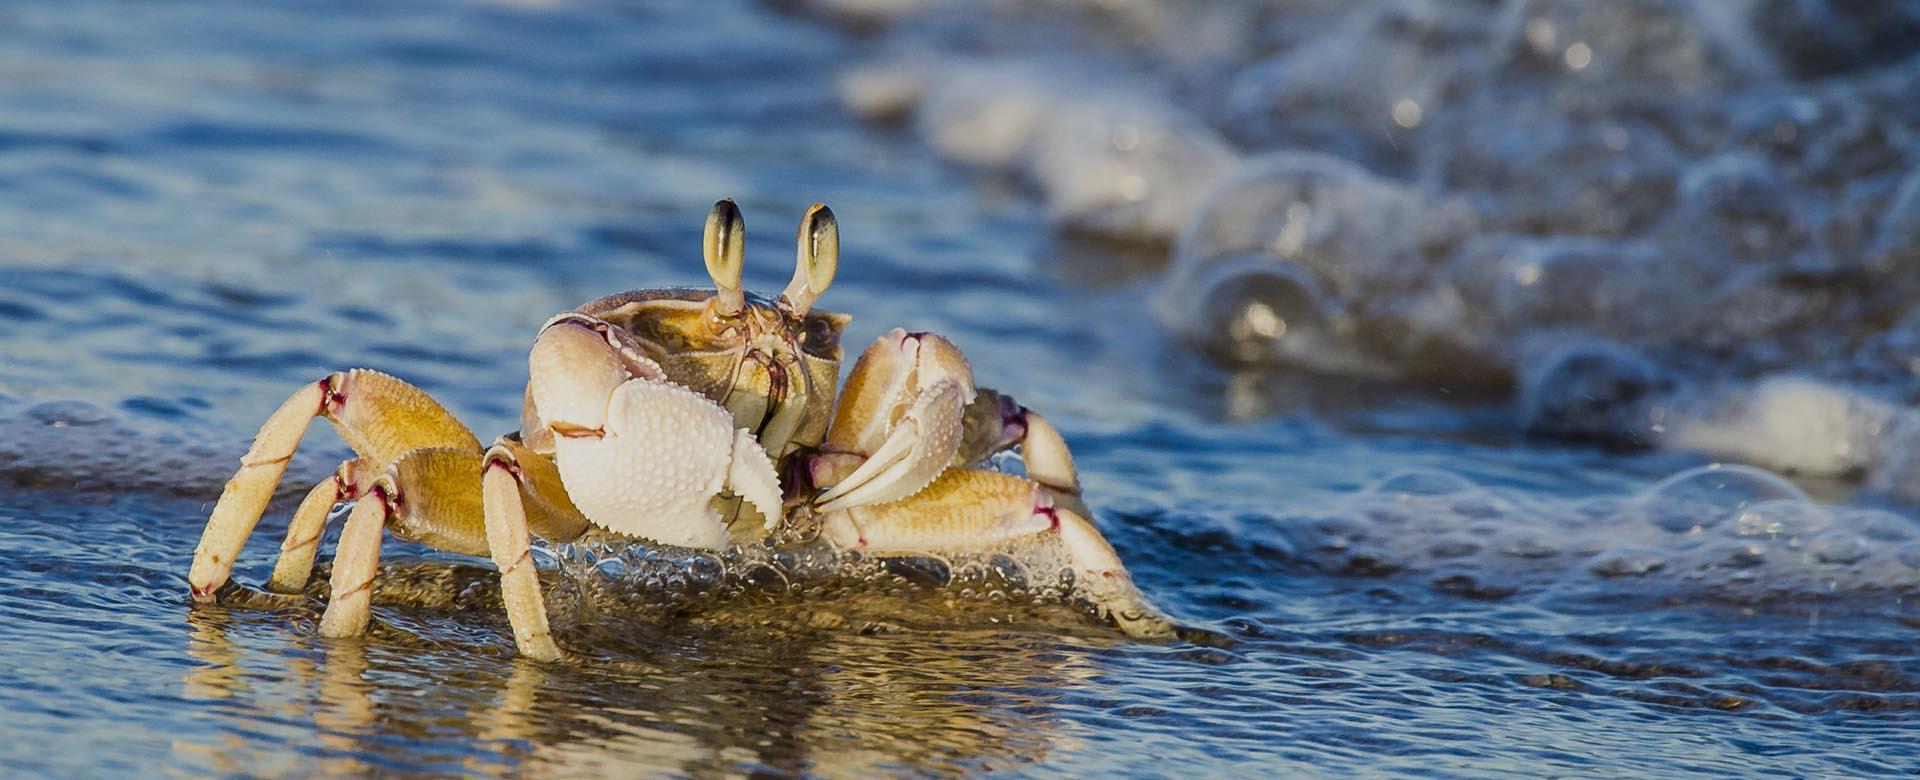 contact-us-western-indian-ocean-marine-science-association